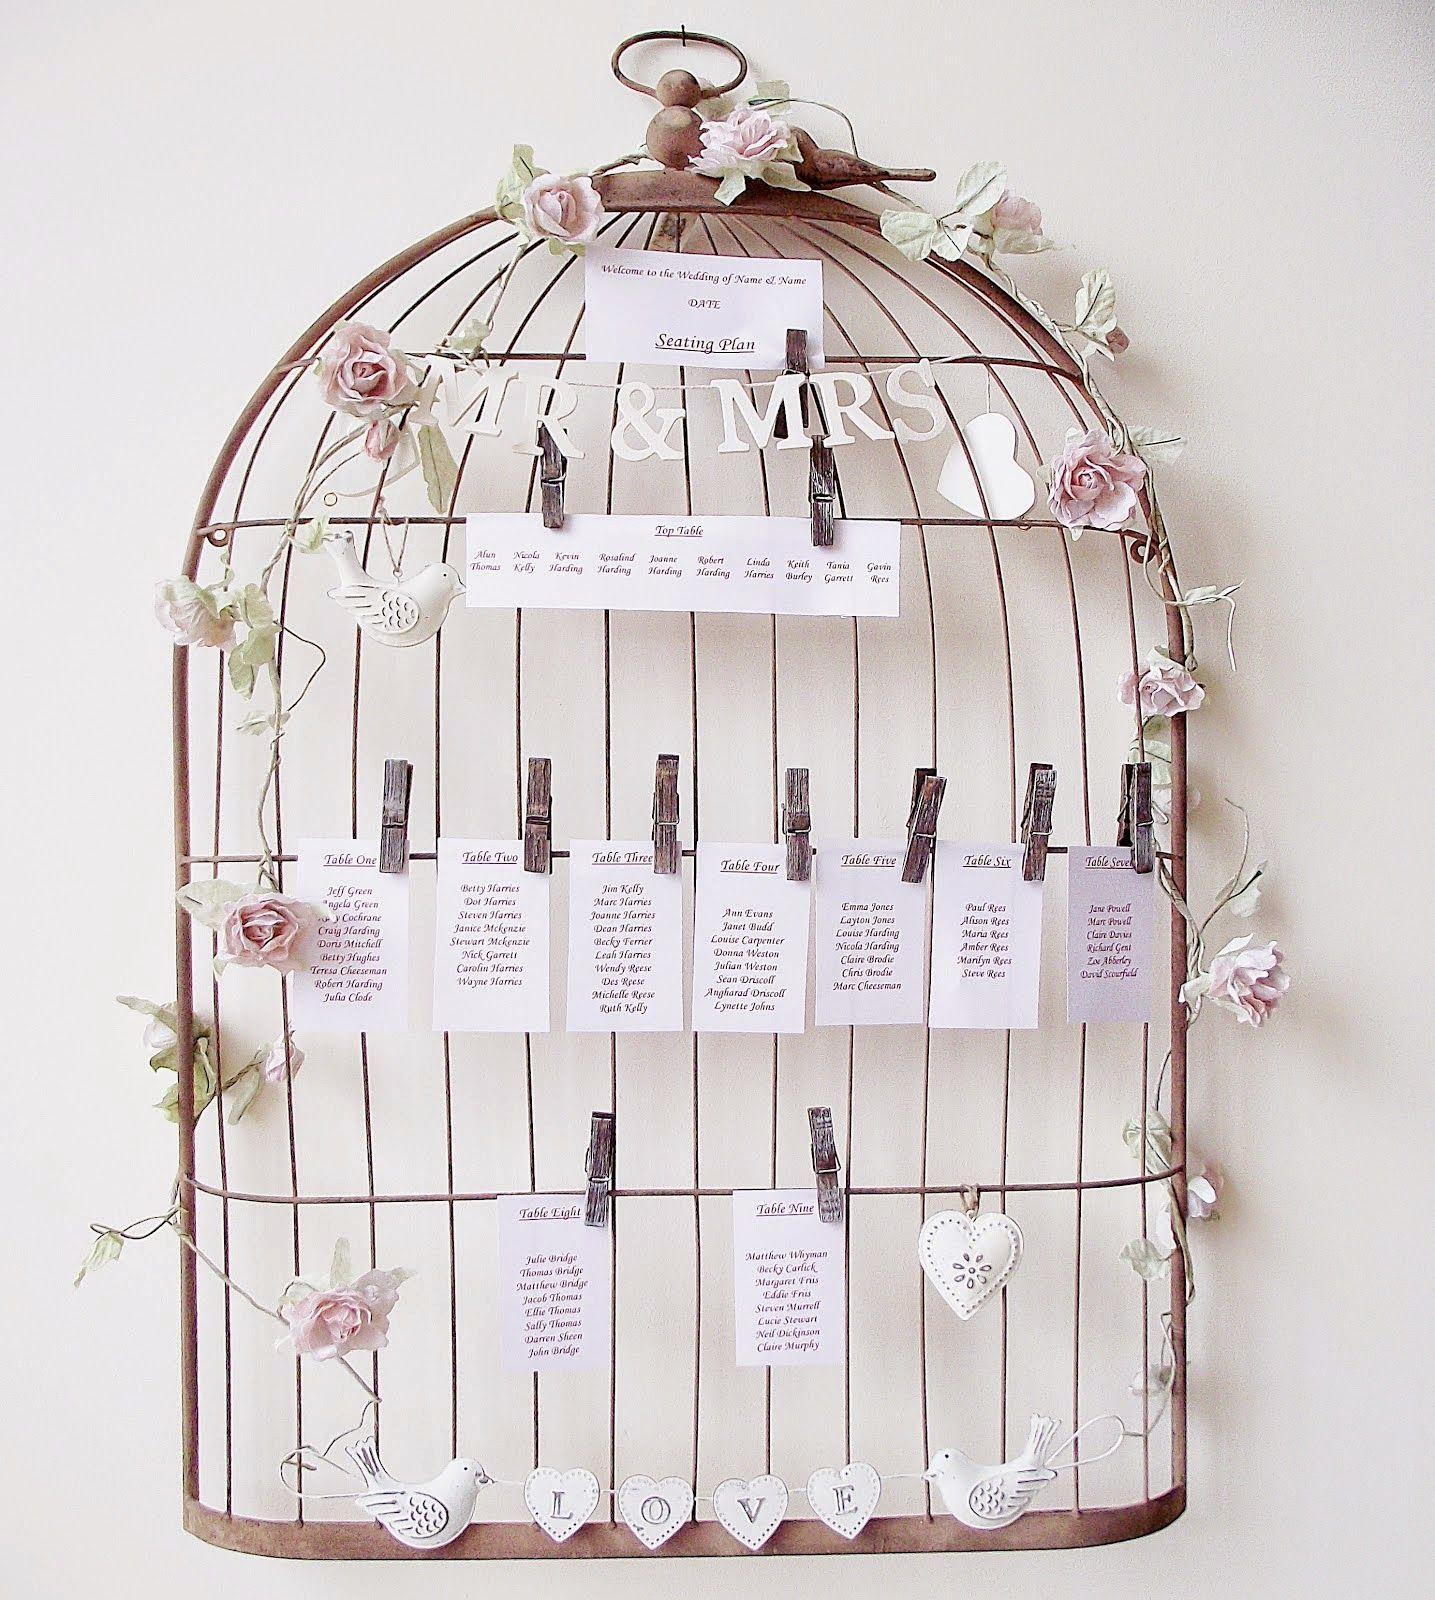 ma d co passe table inspiration cages oiseau. Black Bedroom Furniture Sets. Home Design Ideas